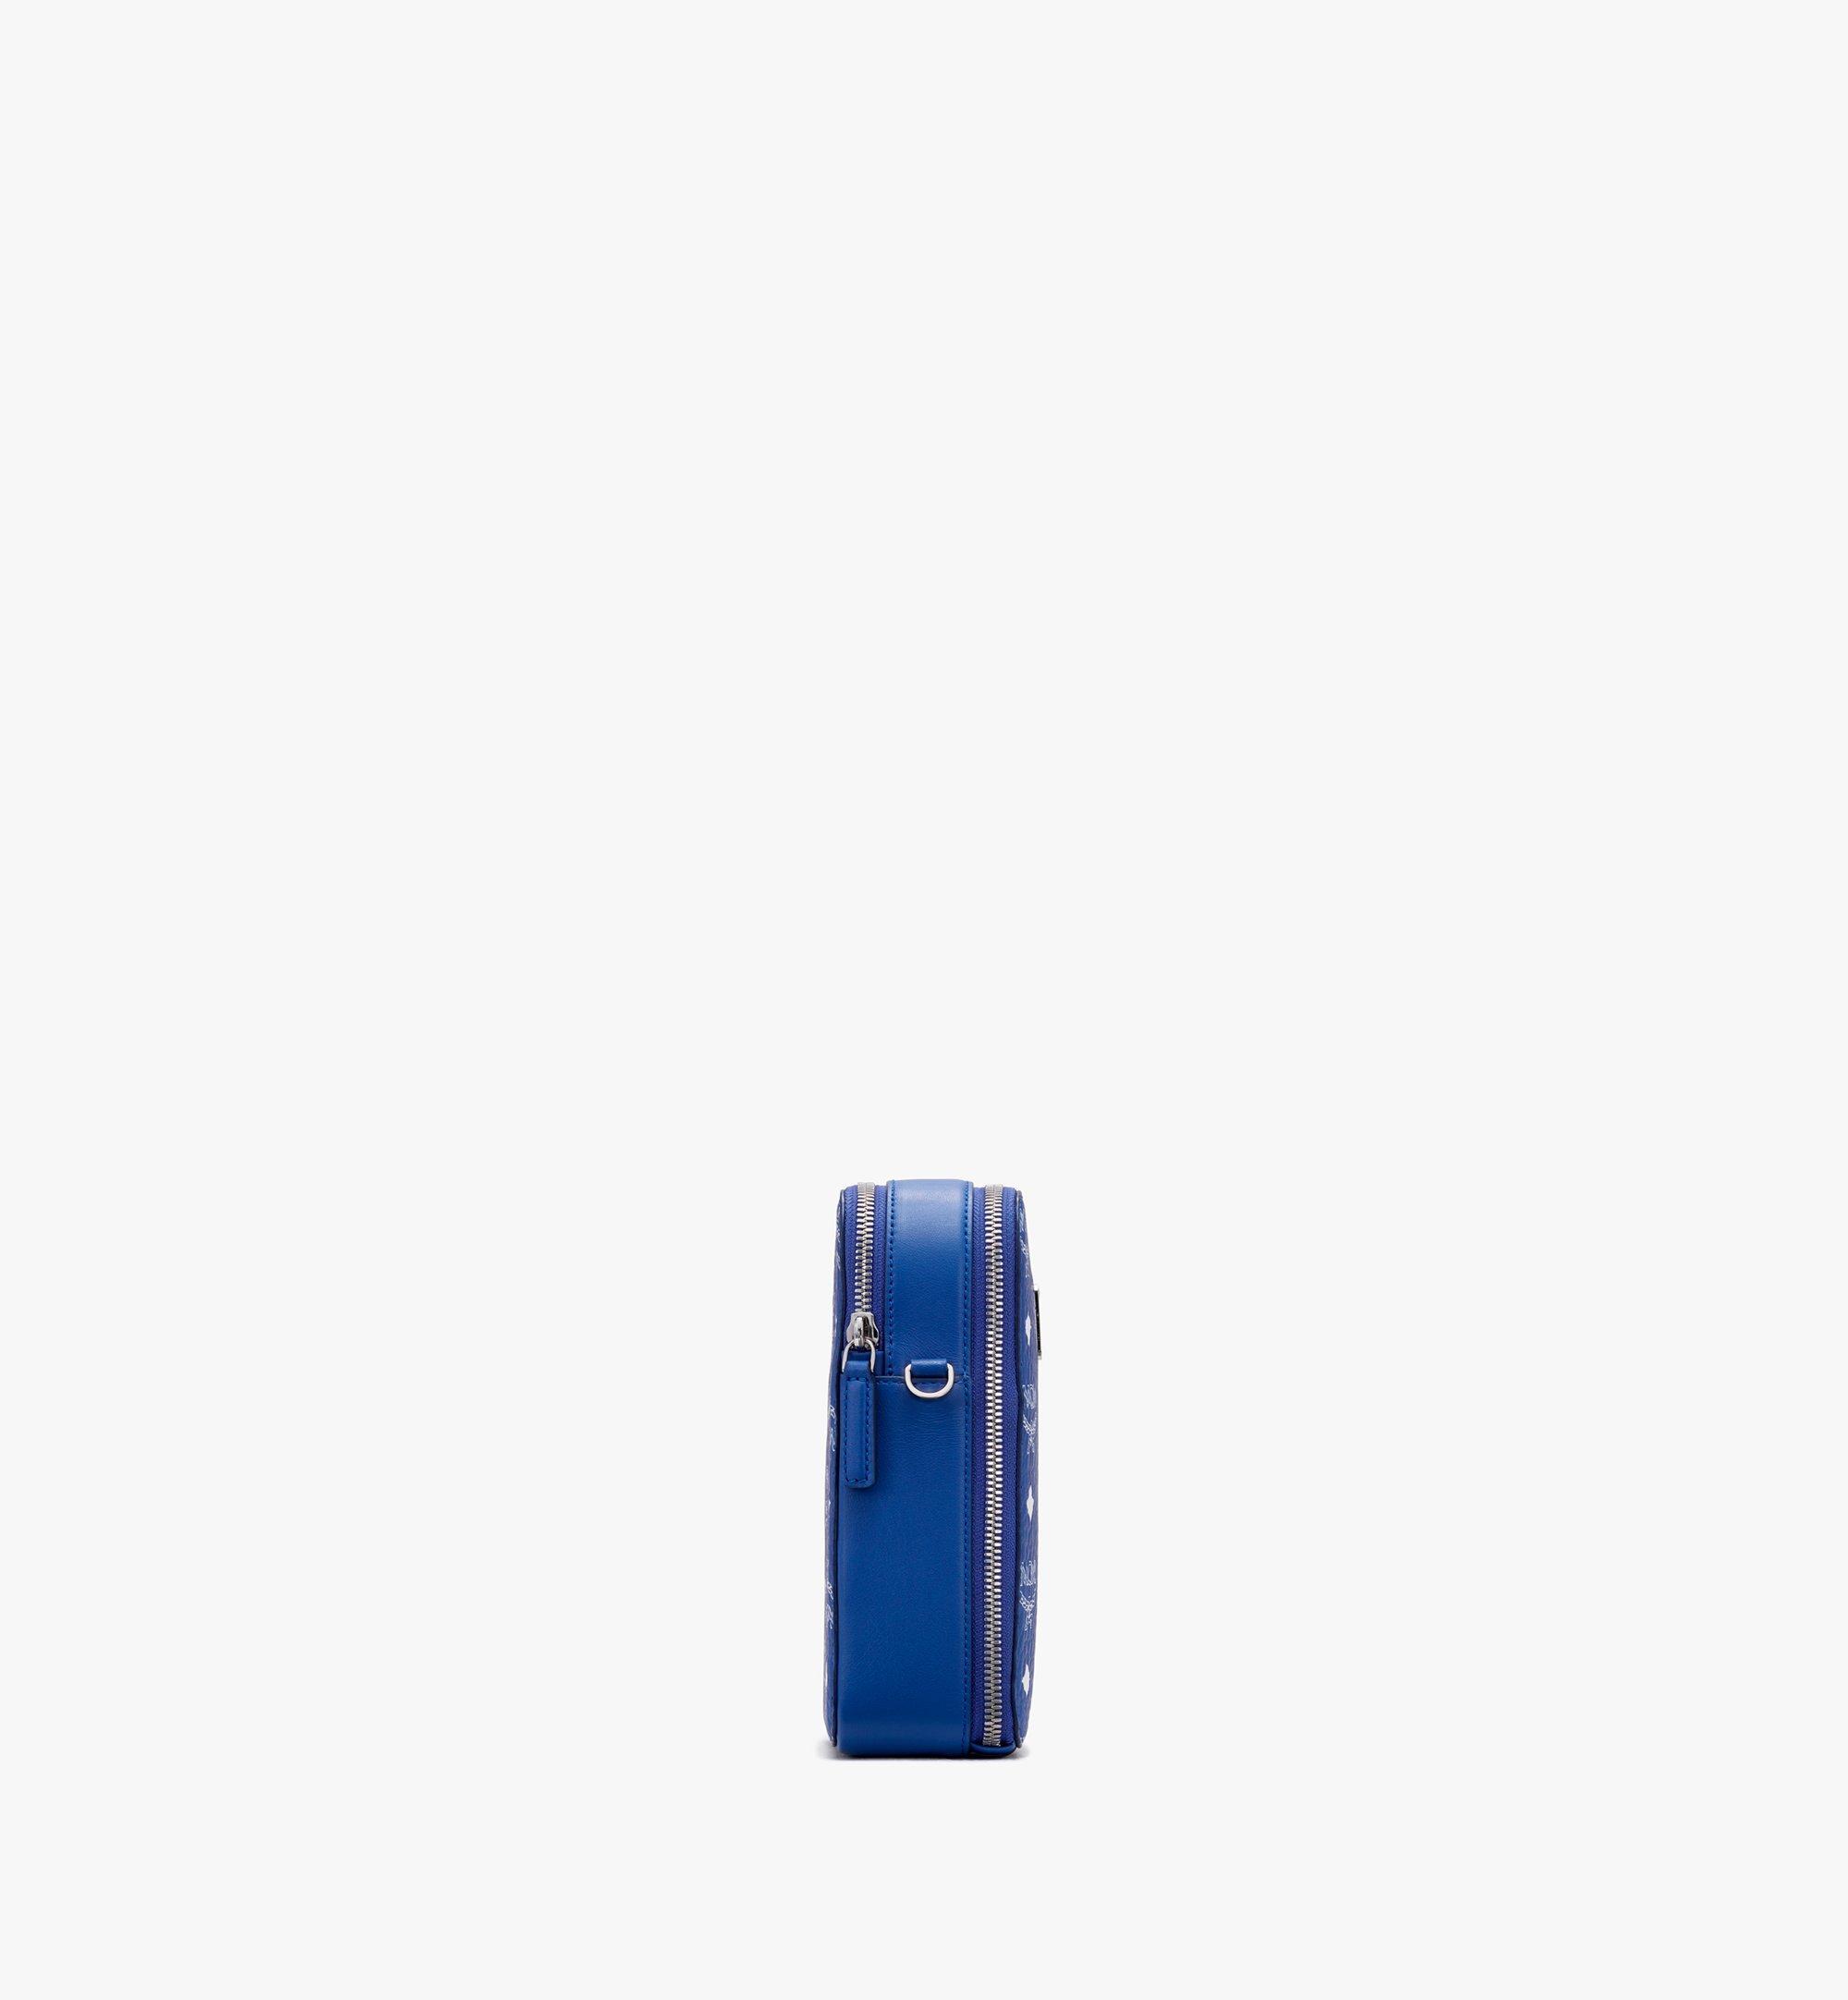 MCM N/S Crossbody-Tasche in Visetos Original Blue MWRASVI02H1001 Alternate View 2